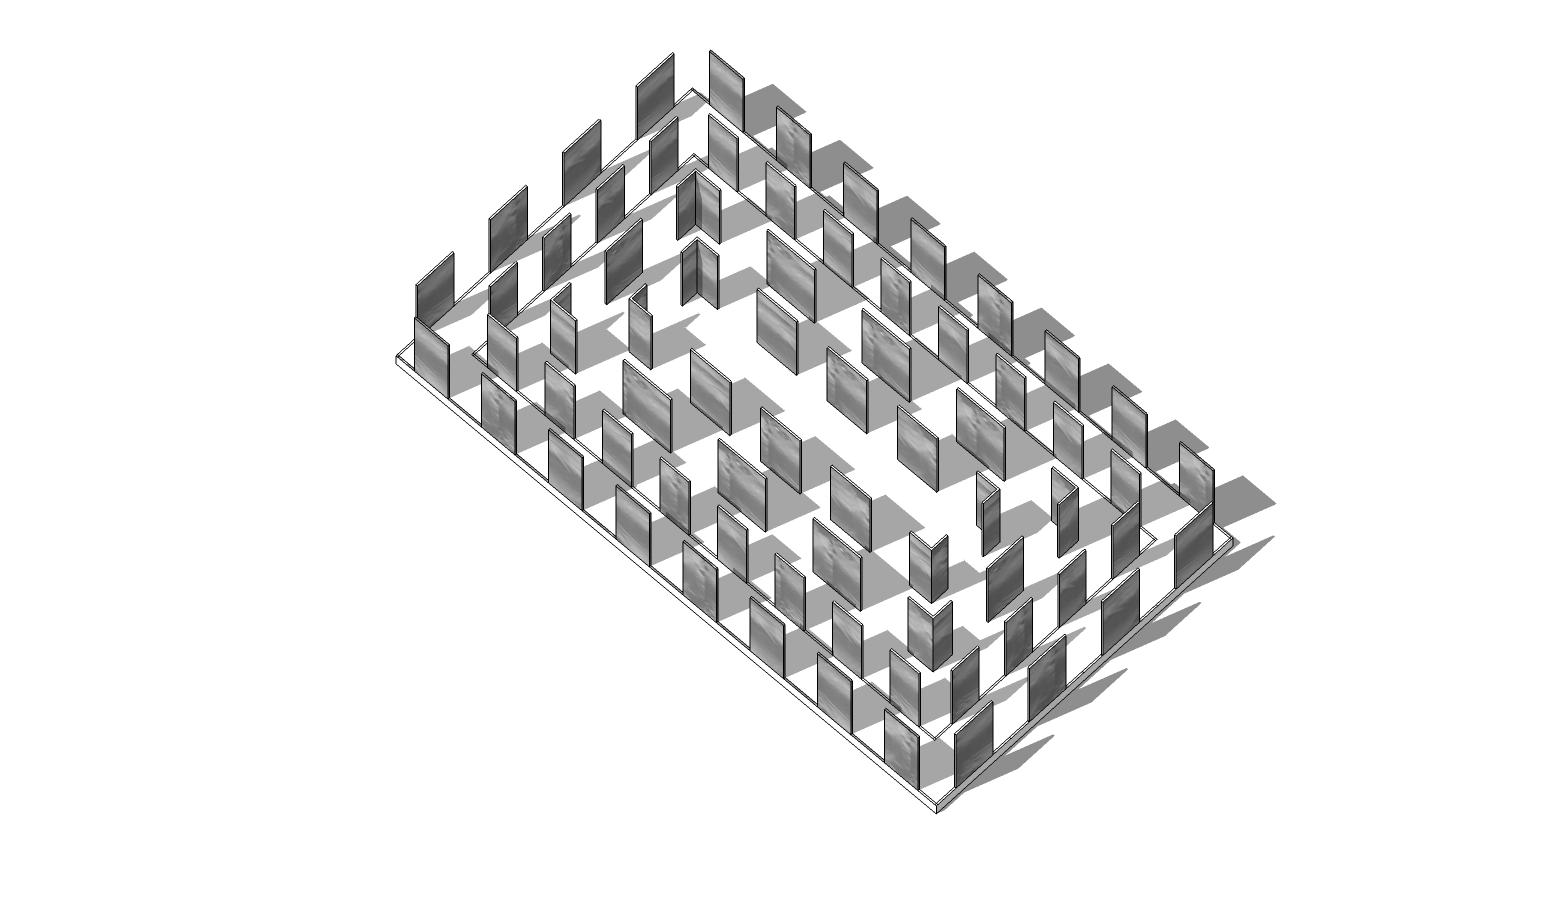 160704_labirint_1.jpg